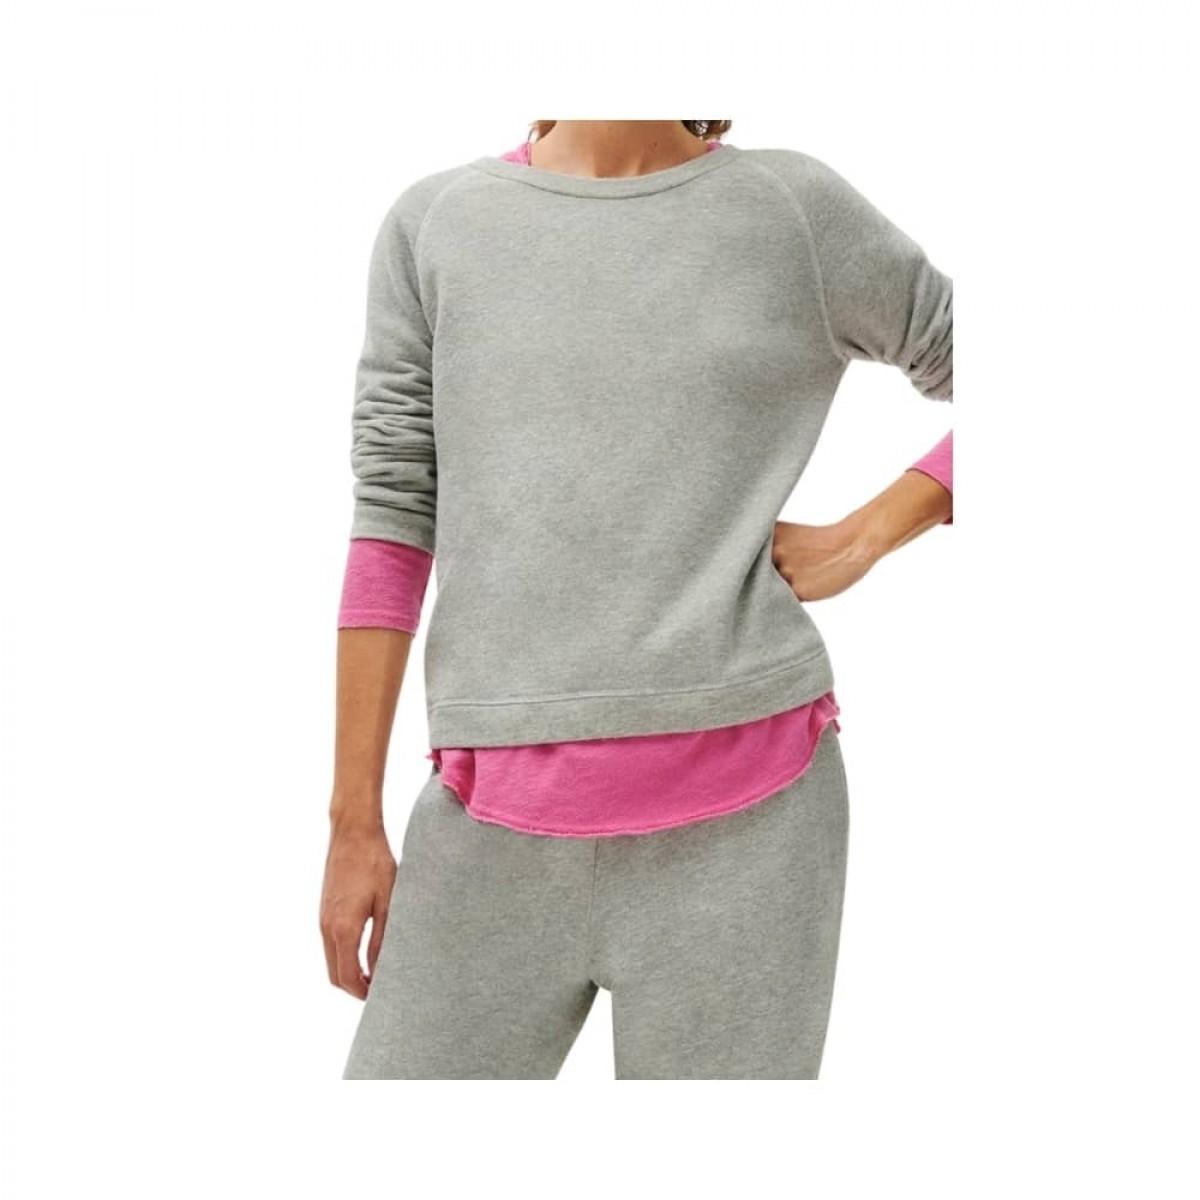 neaford basic sweat - heather grey